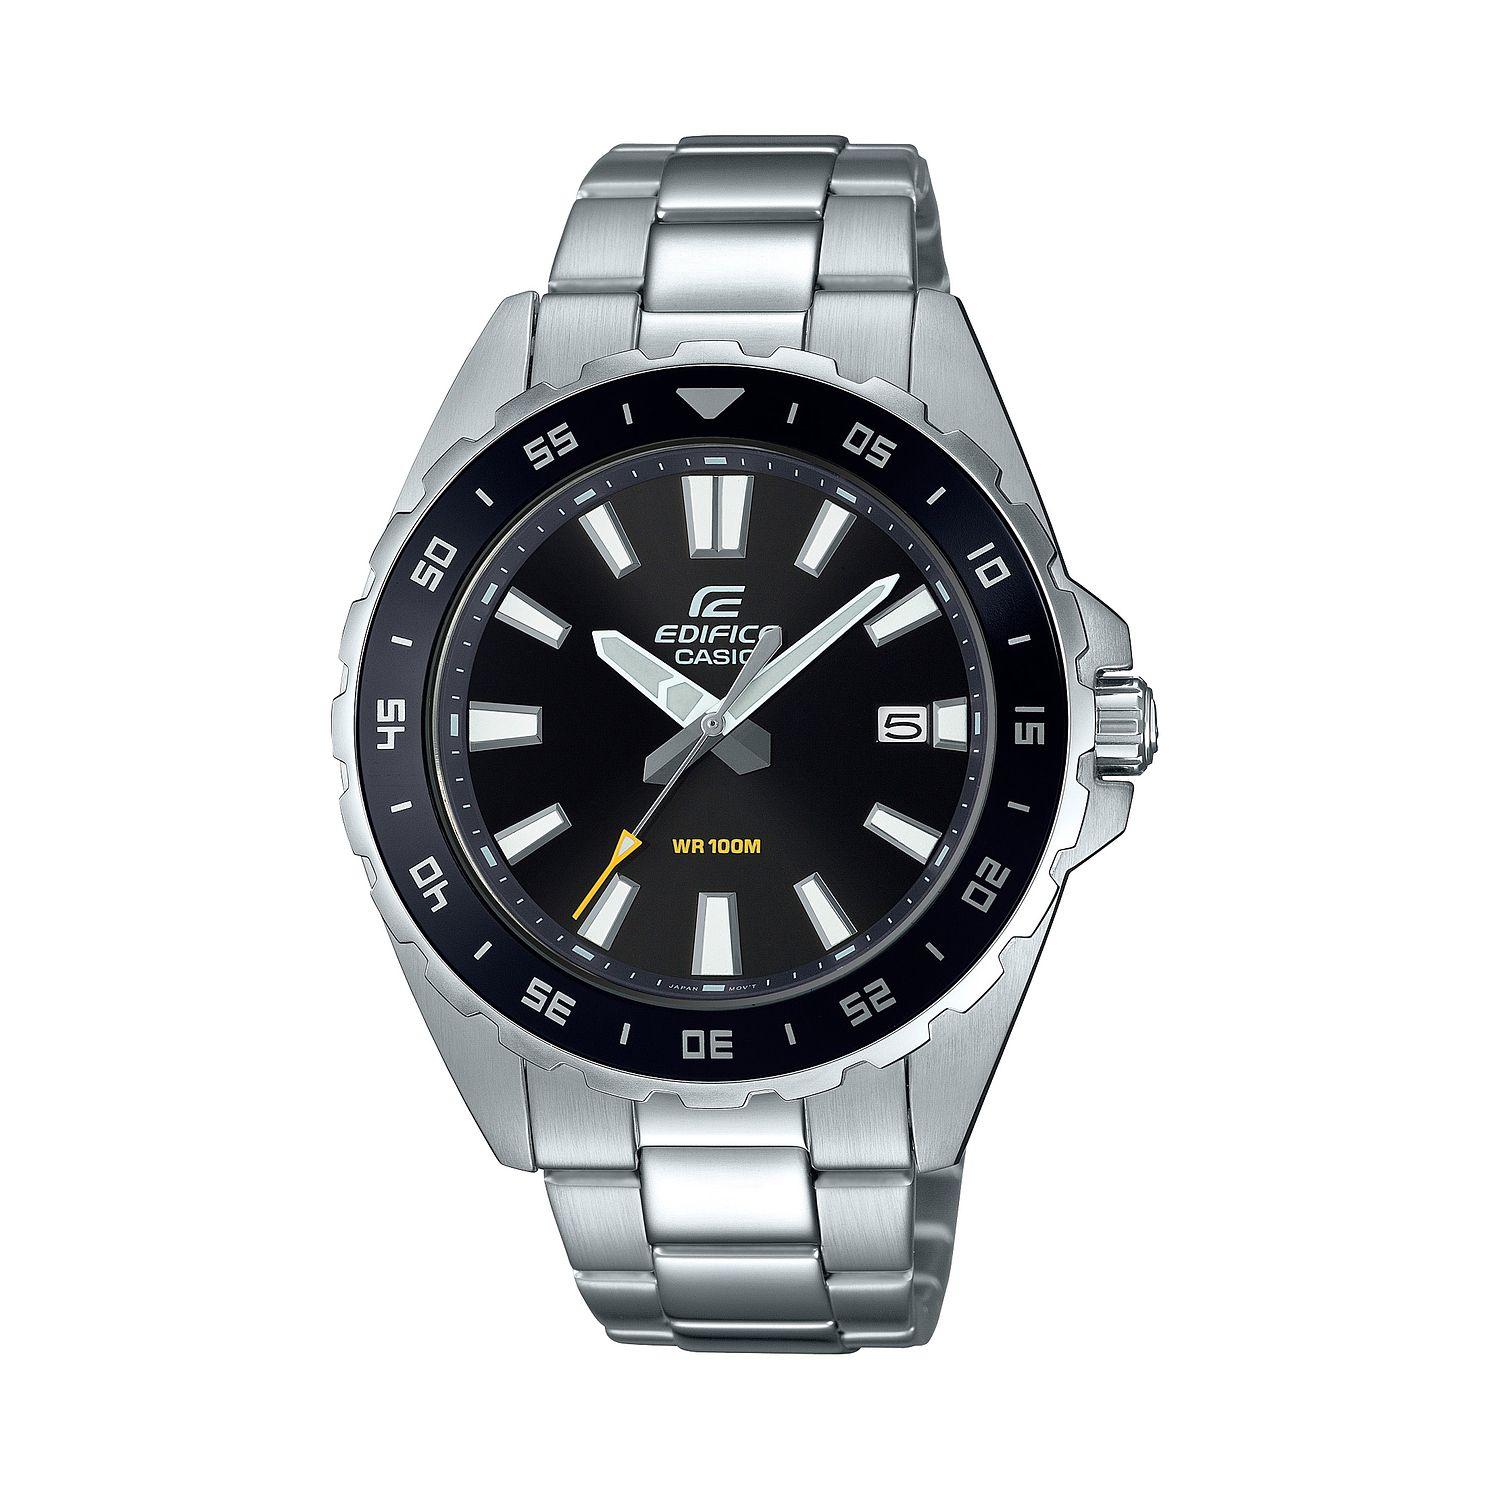 Casio Edifice Men's Stainless Steel Bracelet Watch £50.99 at H.Samuel